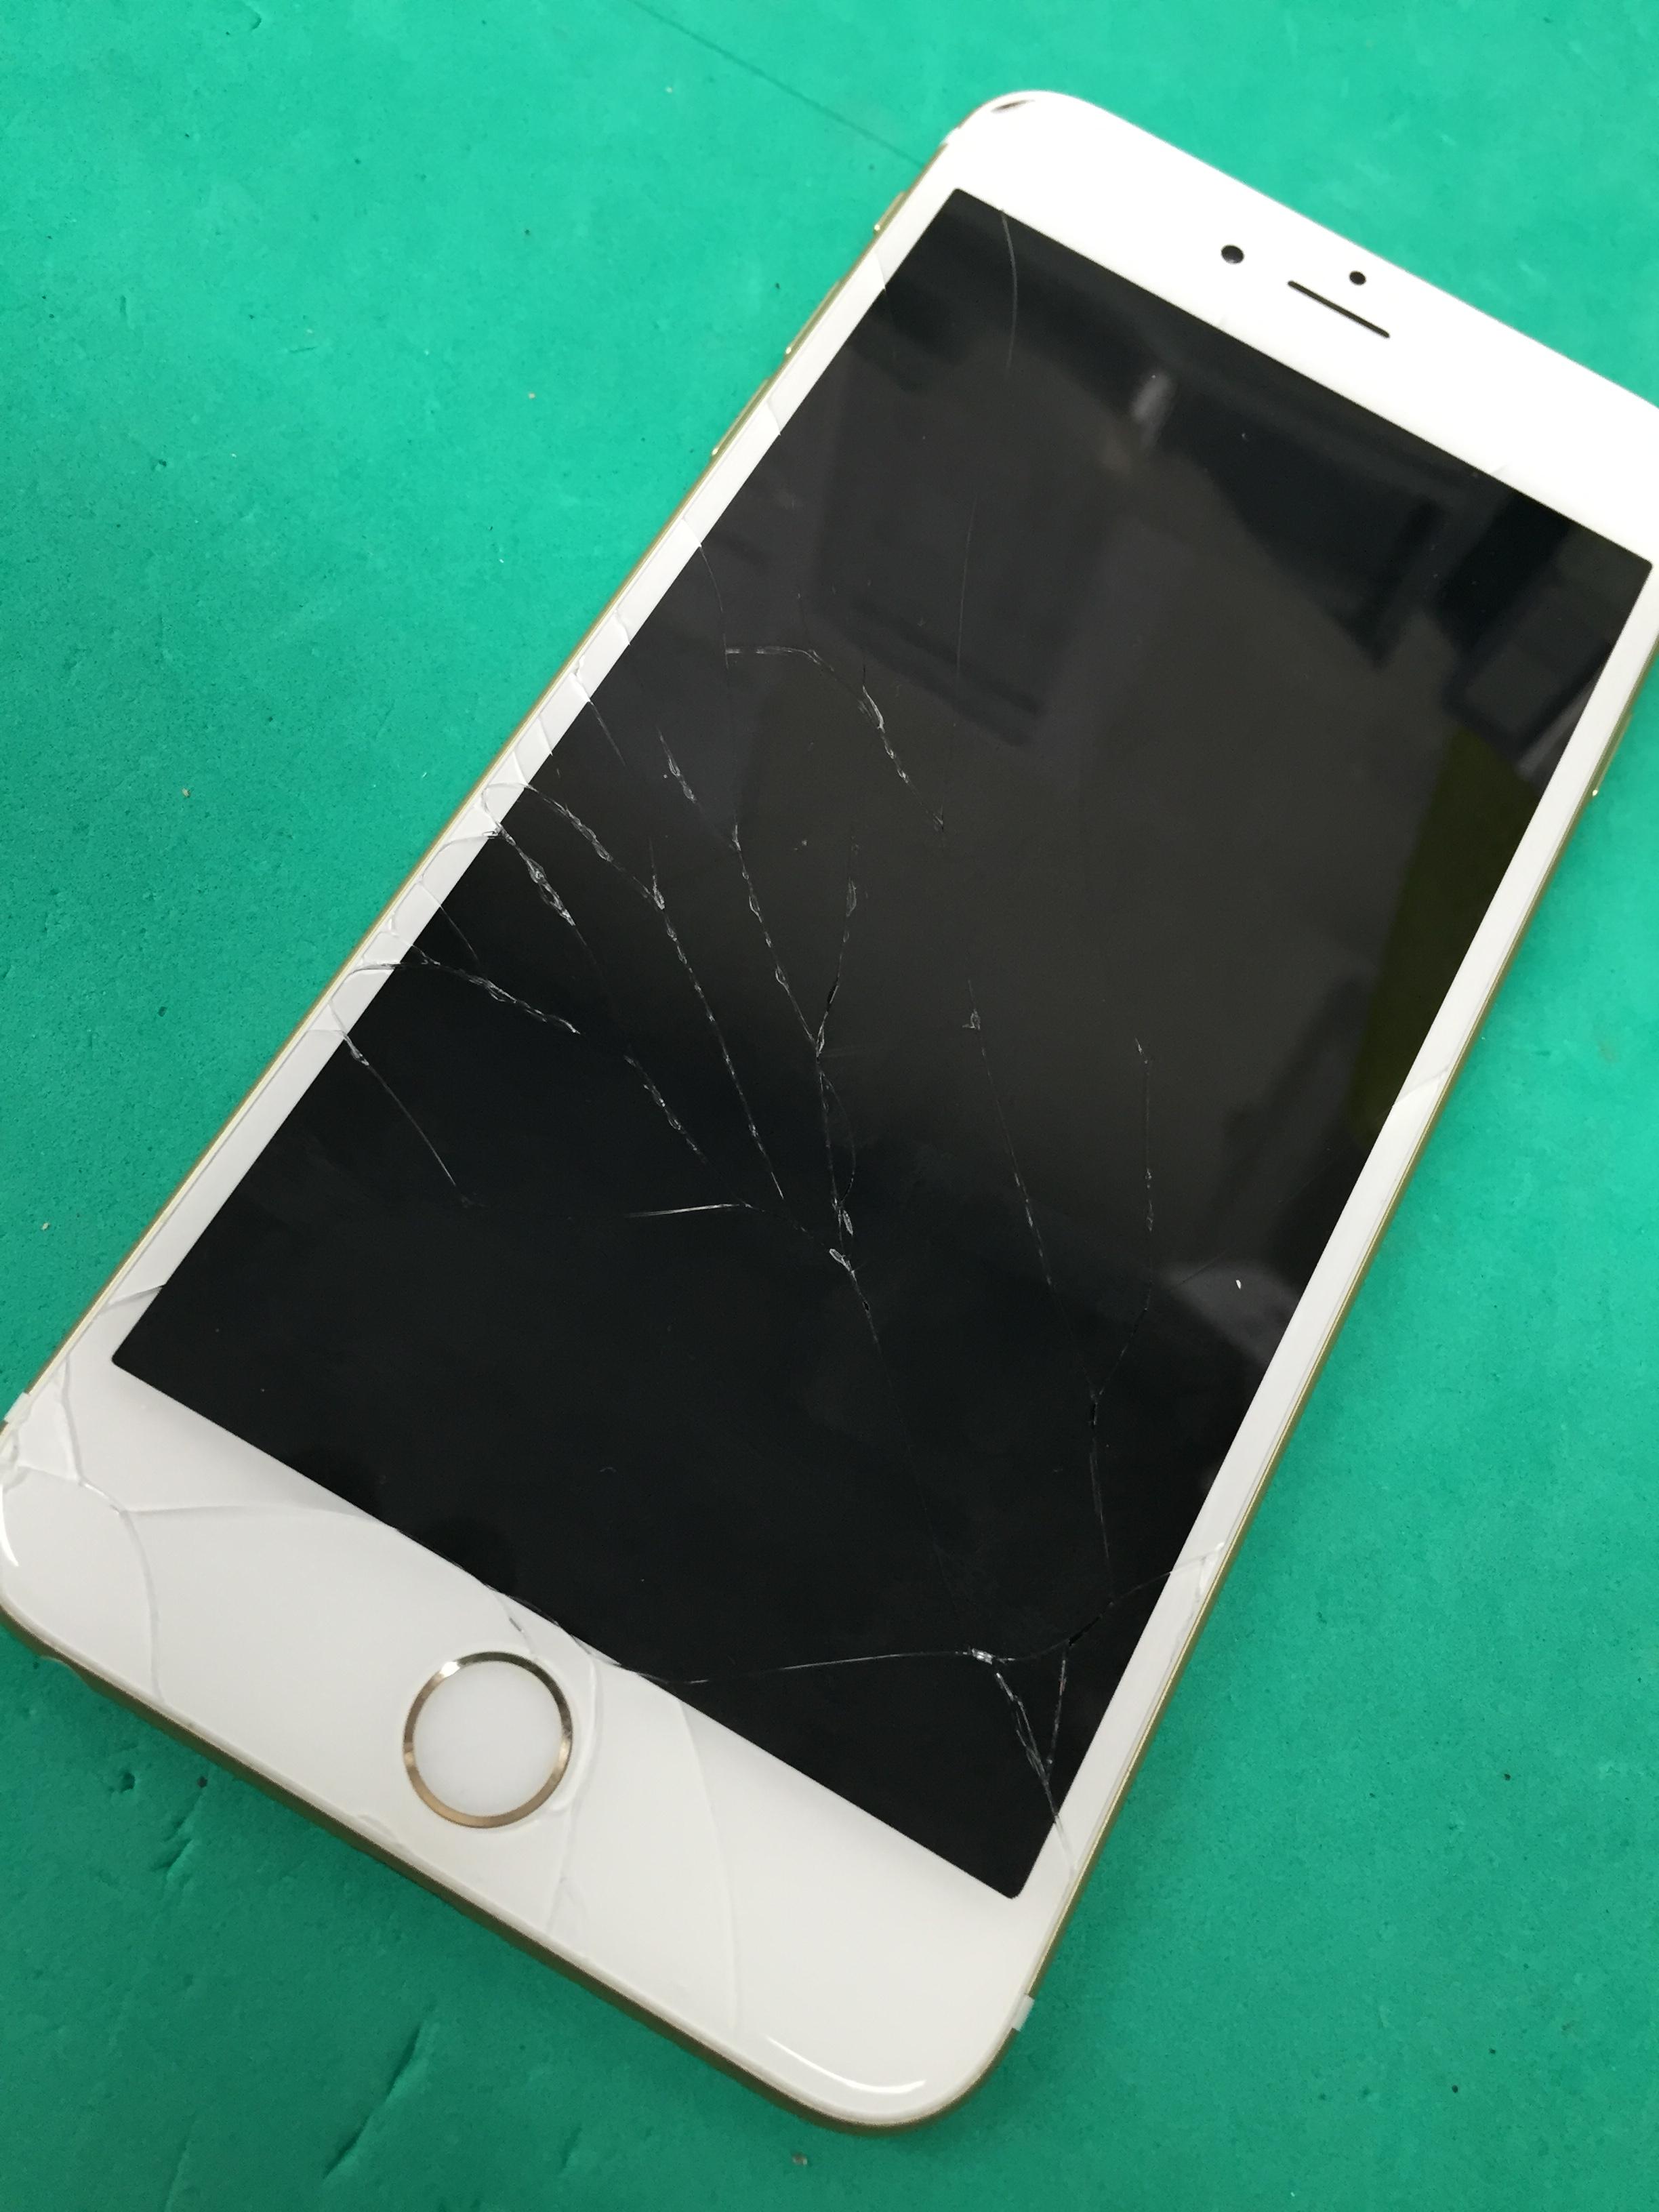 iPhoneの画面が割れてしまう前の事前防止を!!